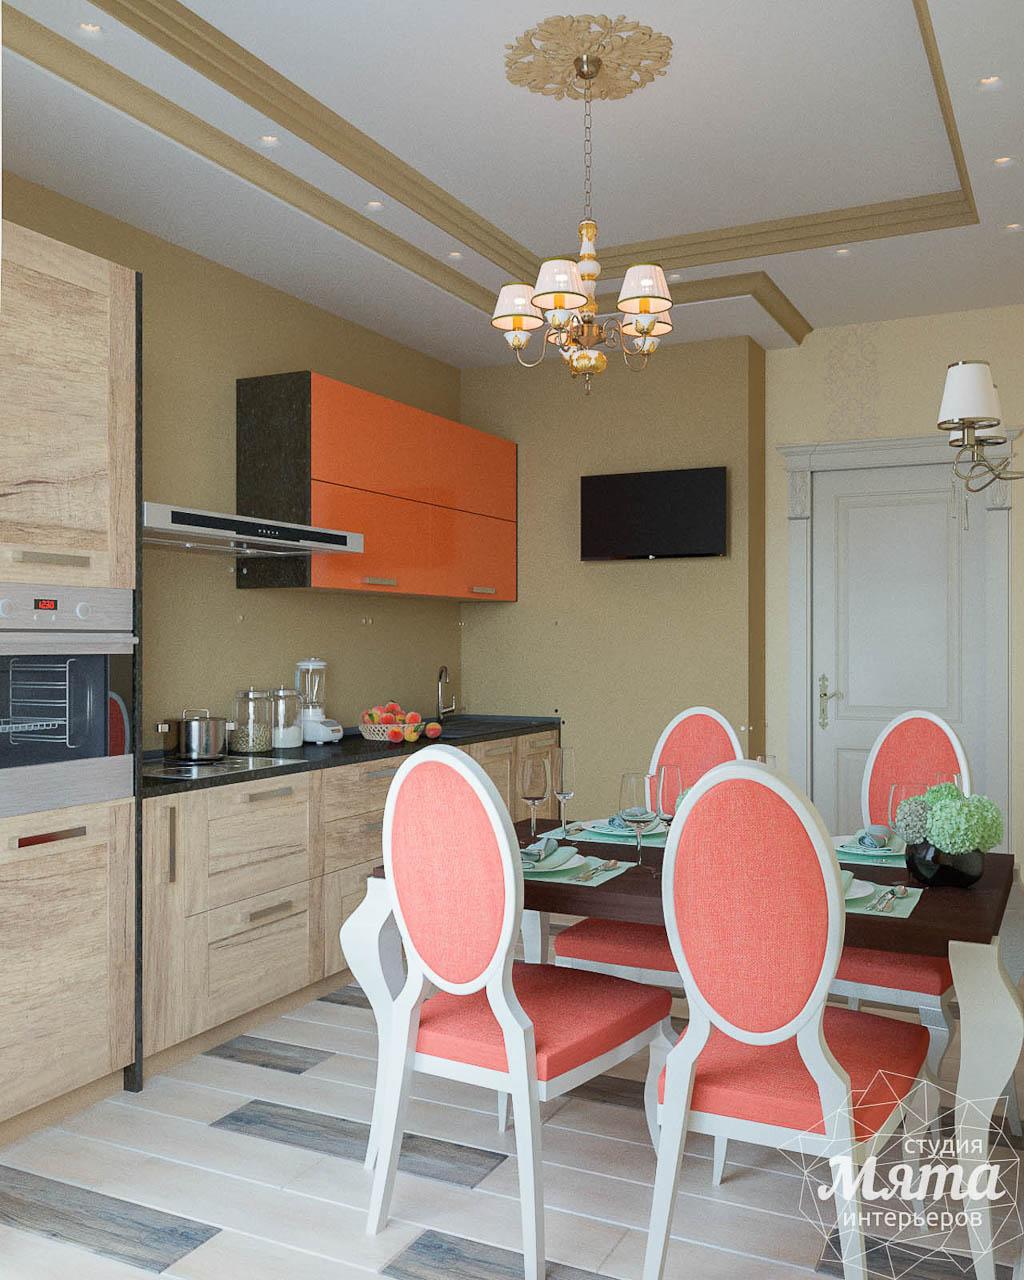 Дизайн интерьера и ремонт трехкомнатной квартиры в Карасьозерском 2 img576965452